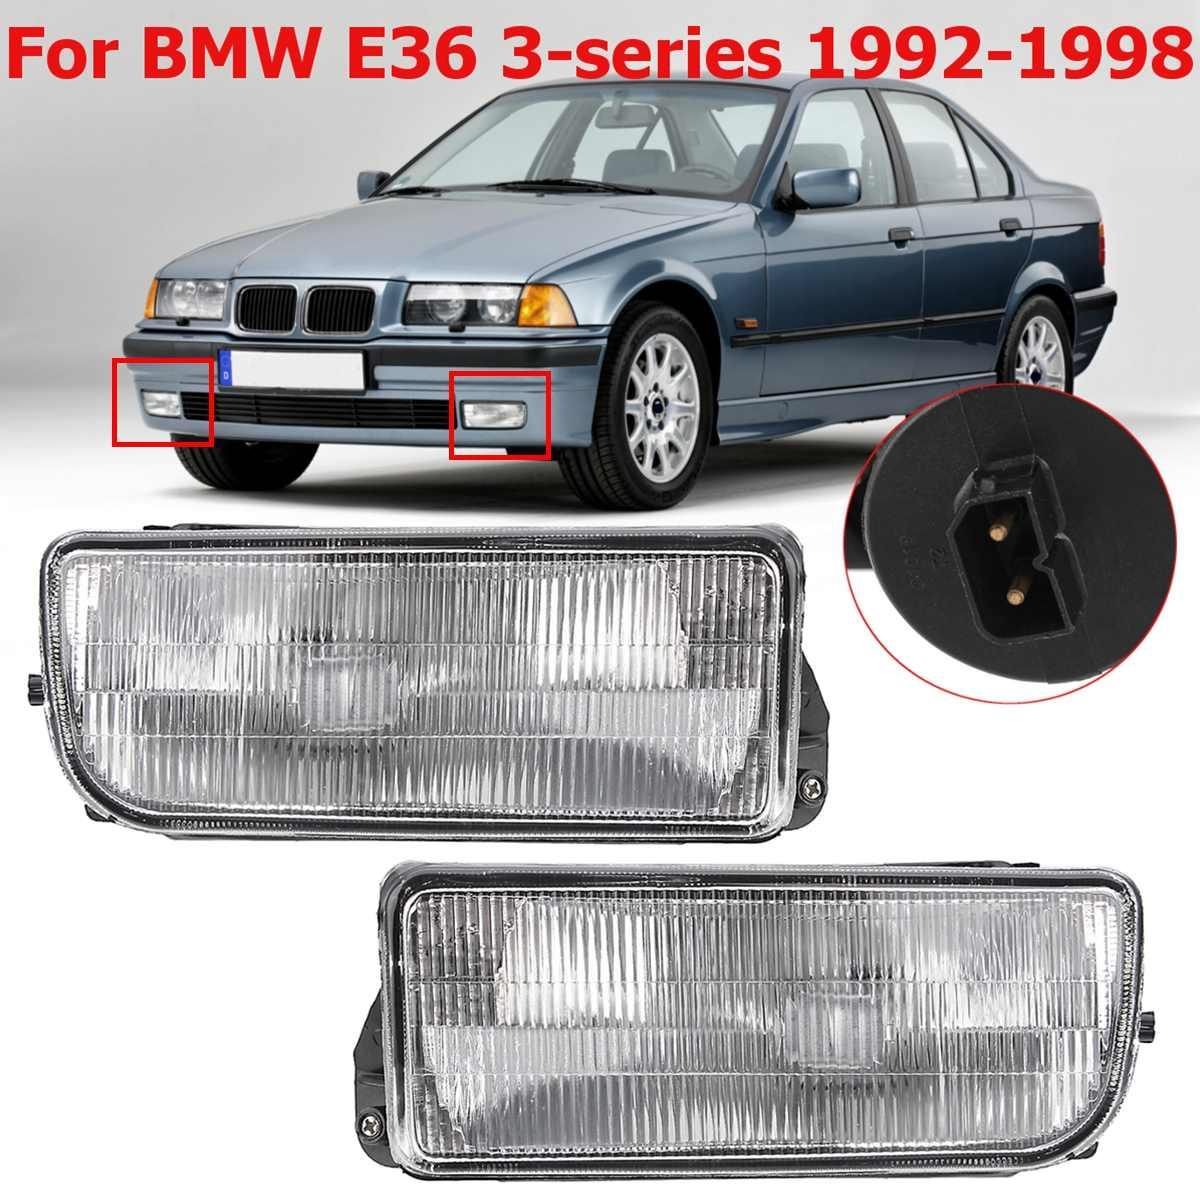 For BMW E36 M3 3-Series 1992-1998 2pcs//Set Car Front Fog Light Bumper Fog Lamp